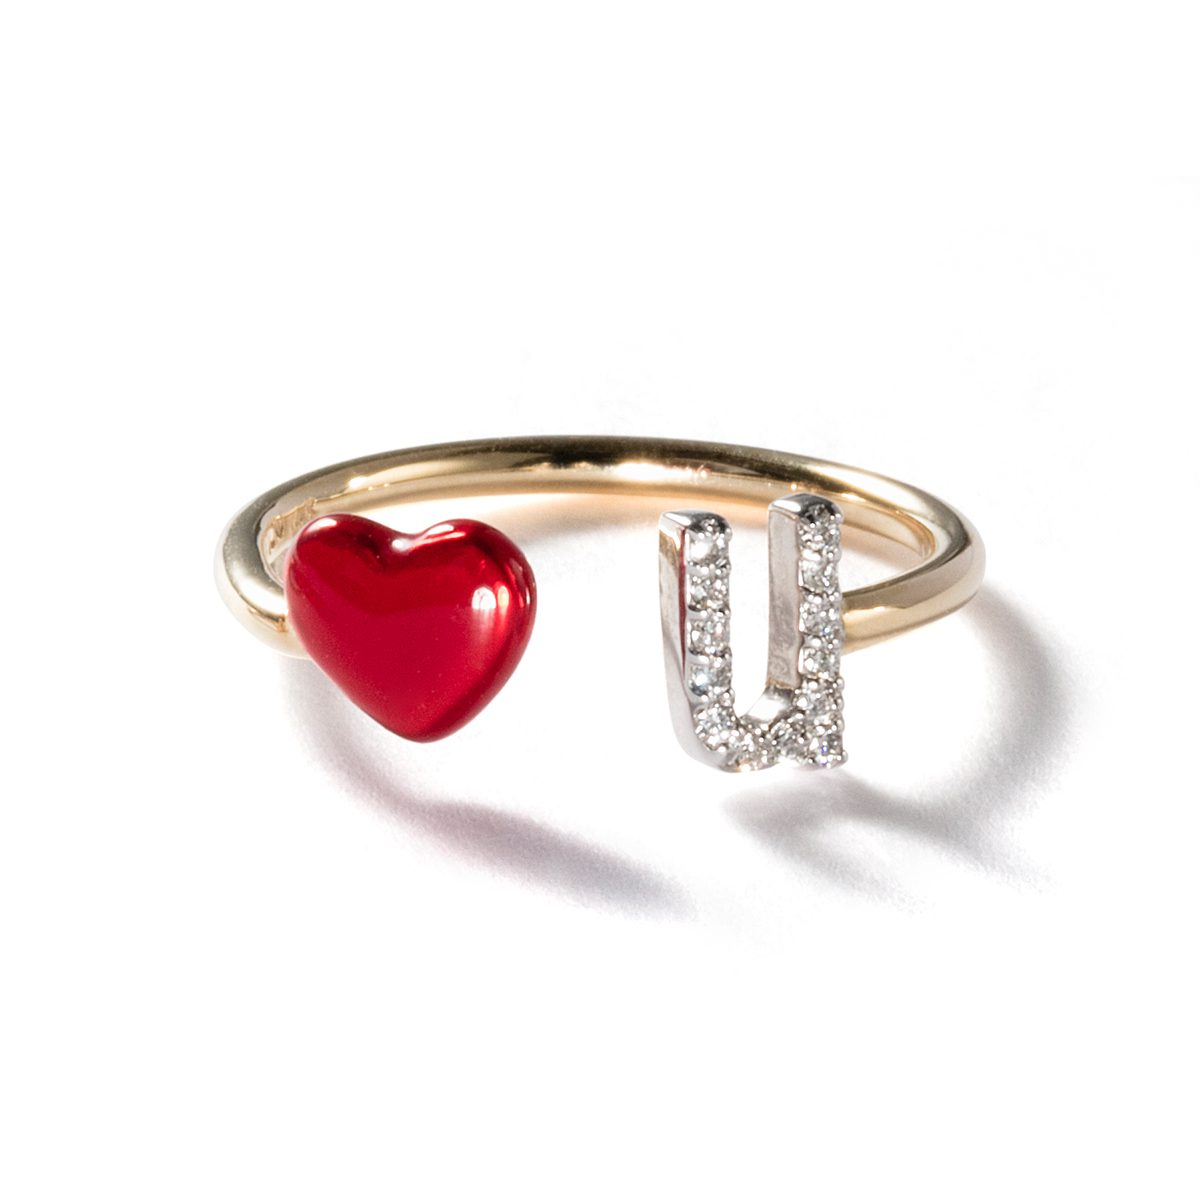 ALISON LOU - LOVE U RING|Rings